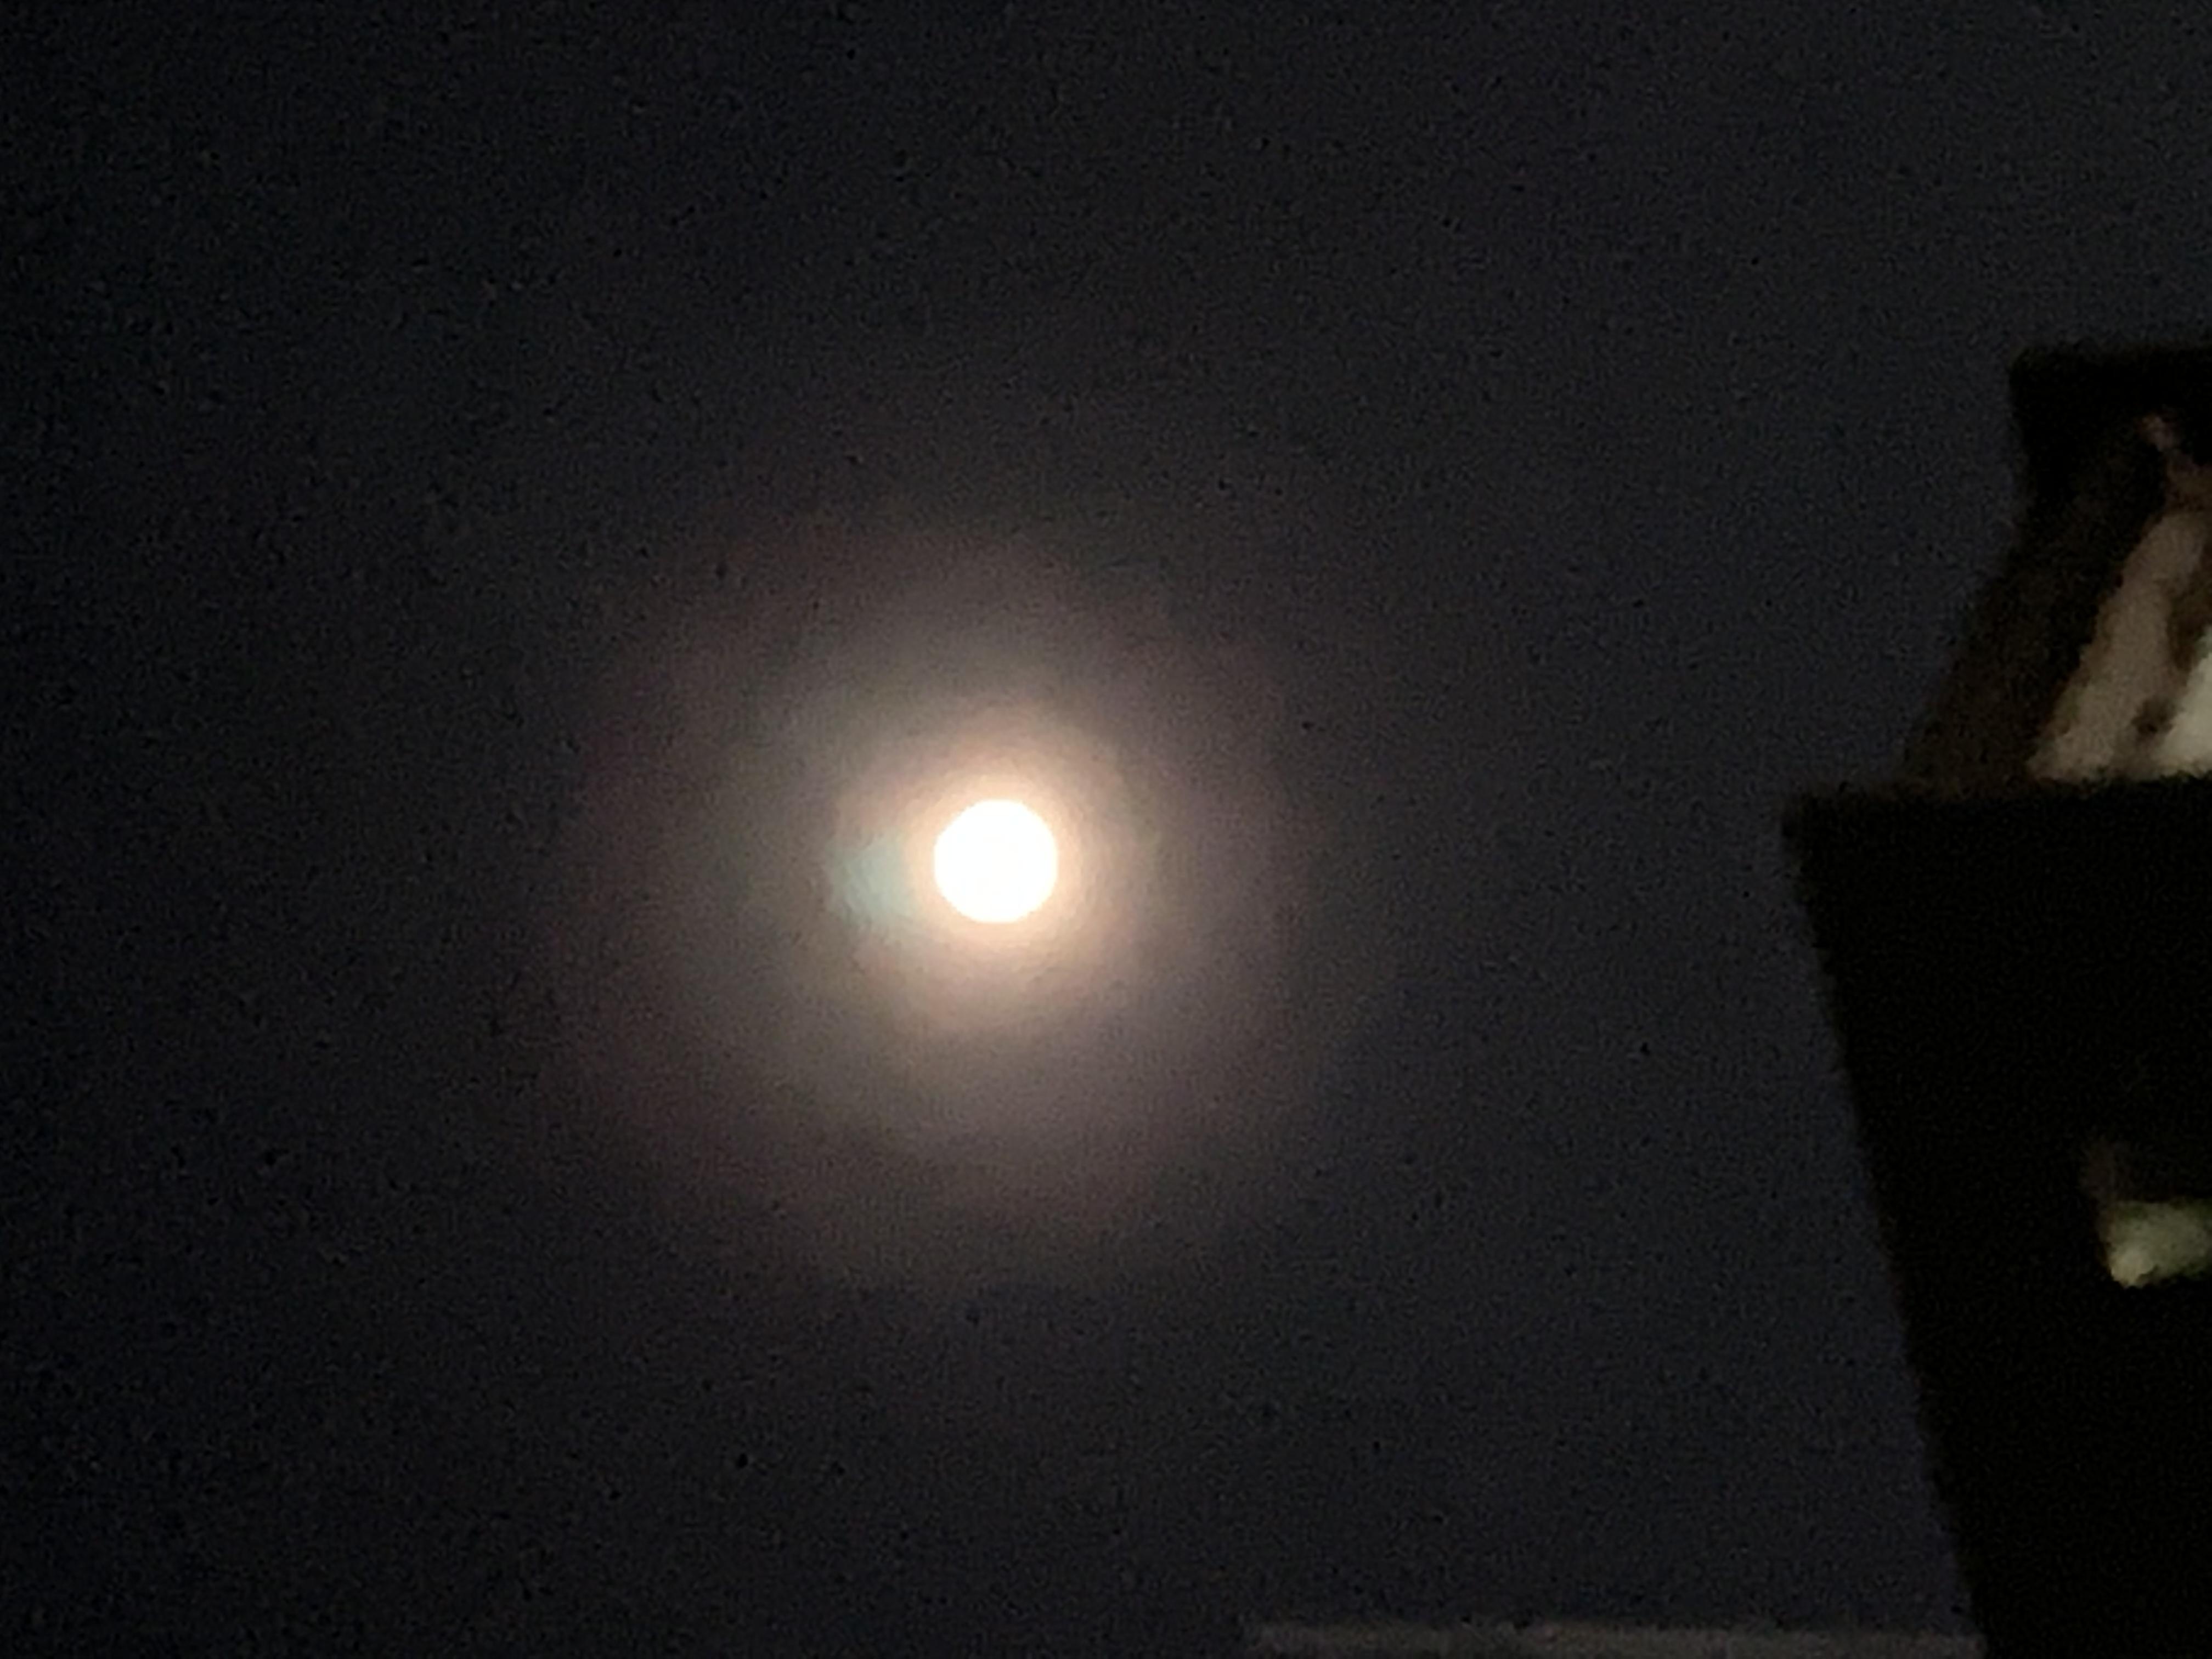 二黒土星☆